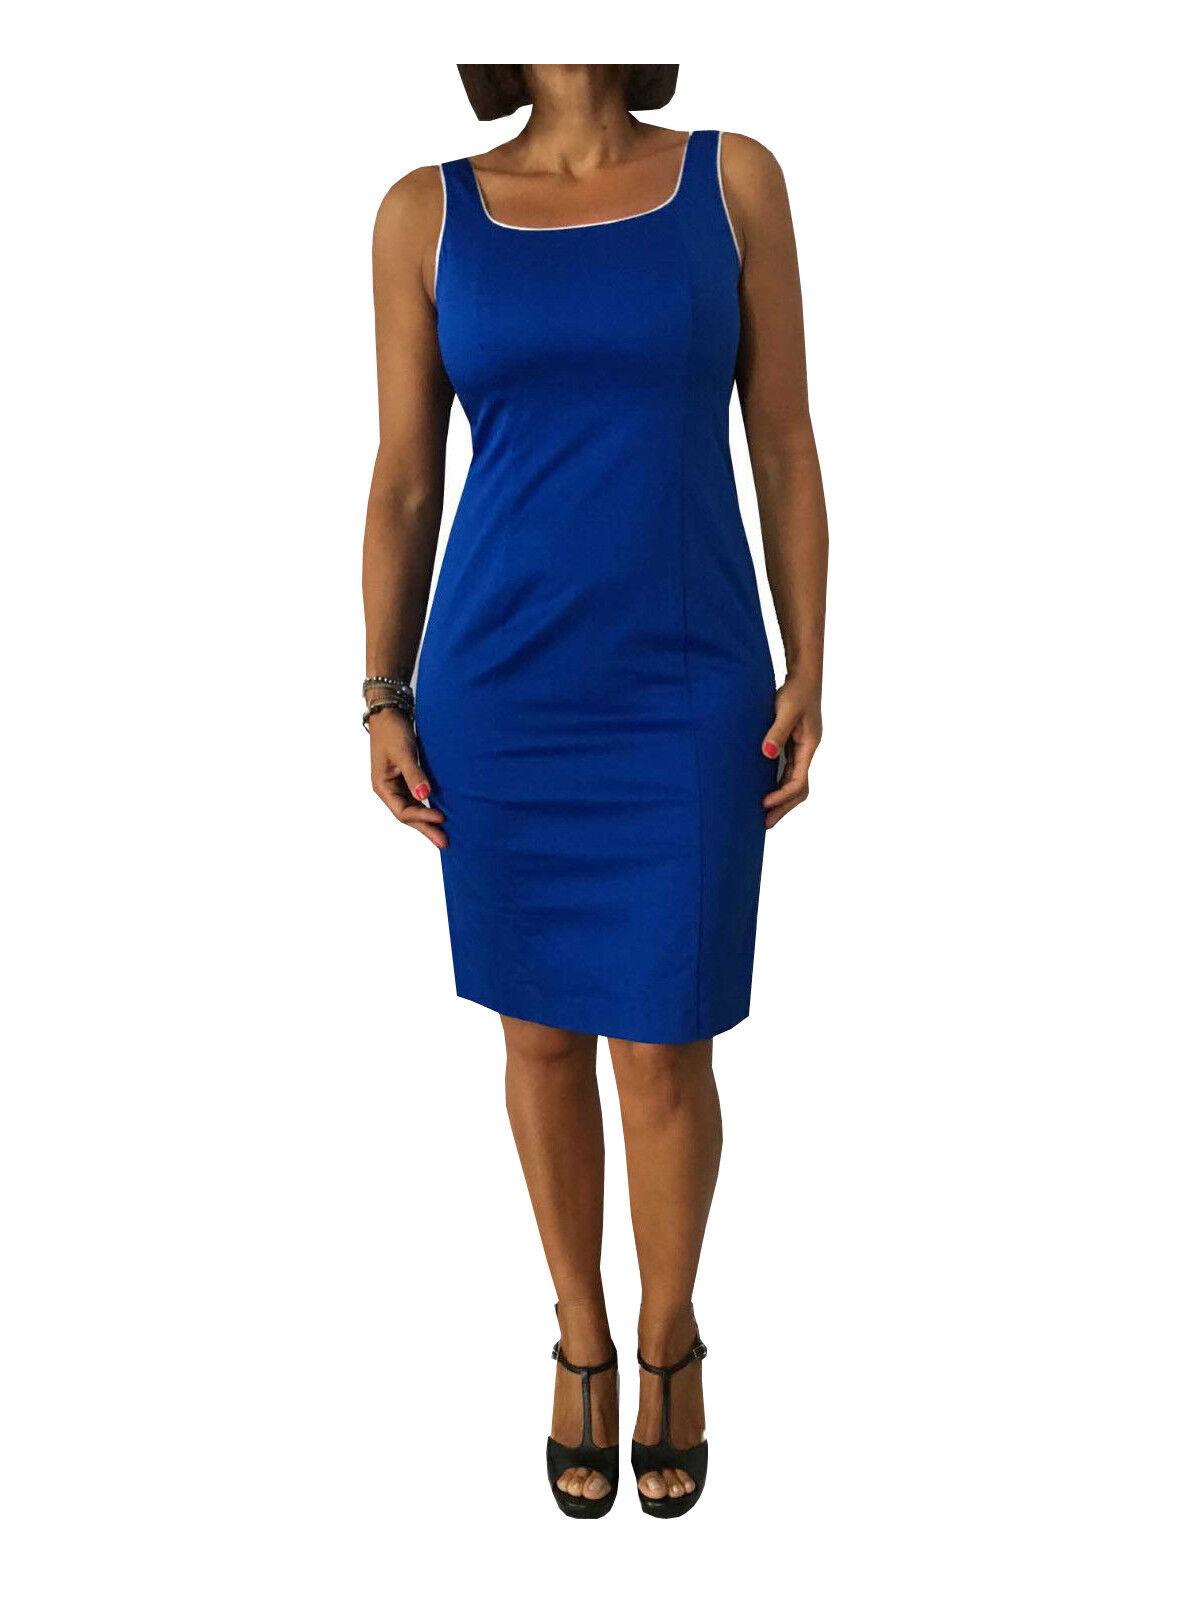 CALALUNA Kleid Frau Reißverschluss hinter KornBlaumenblau mit Profile weiß